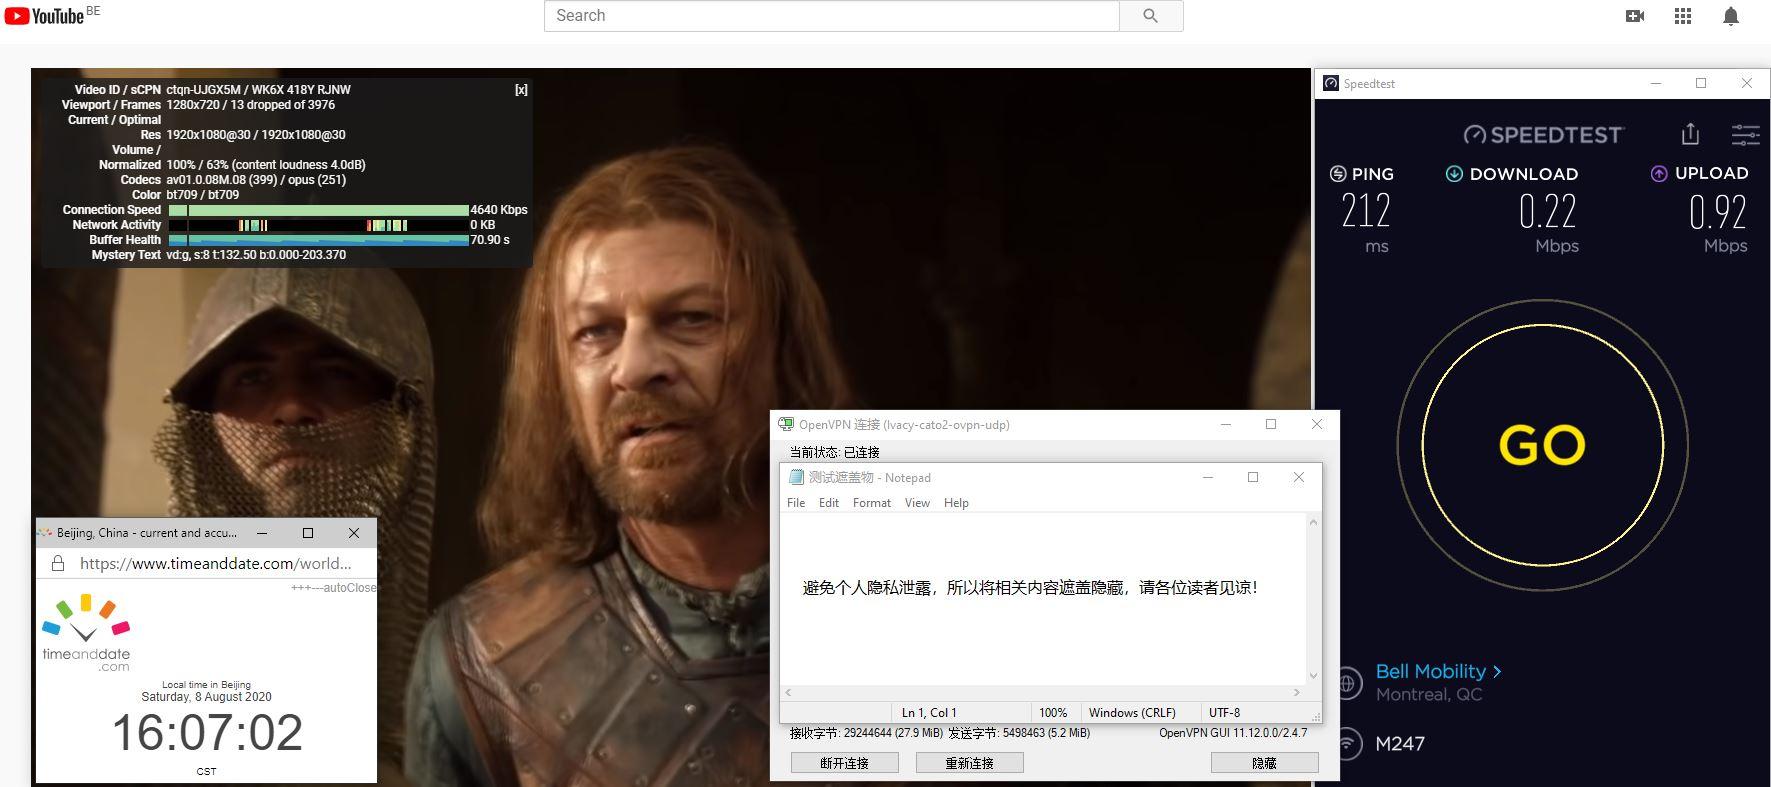 Windows10 IvacyVPN OpenVPN GUI cato2 中国VPN 翻墙 科学上网 翻墙速度测试 - 20200808